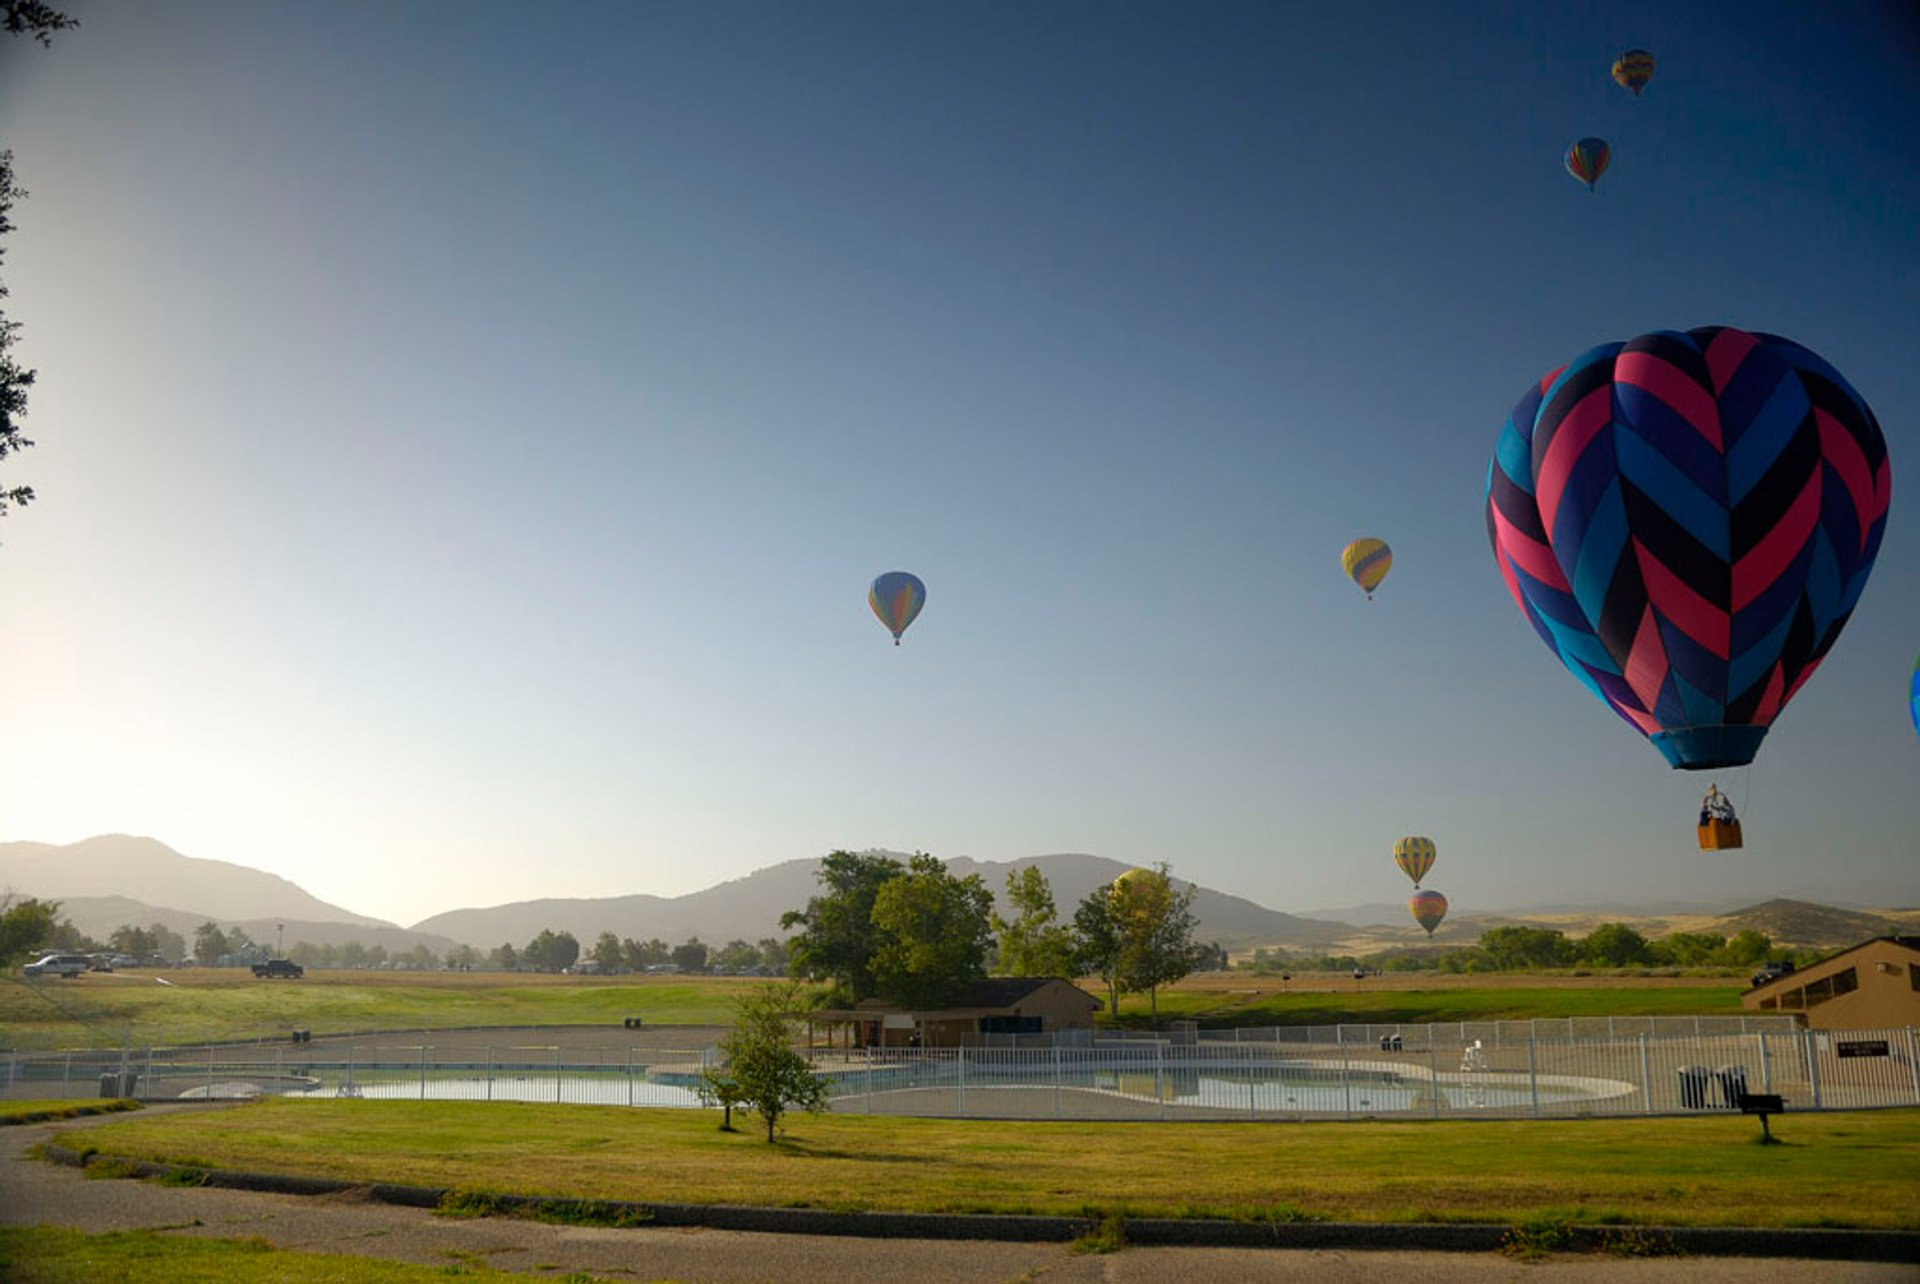 Temecula Valley Balloon & Wine Festival in California - Best Season 2019